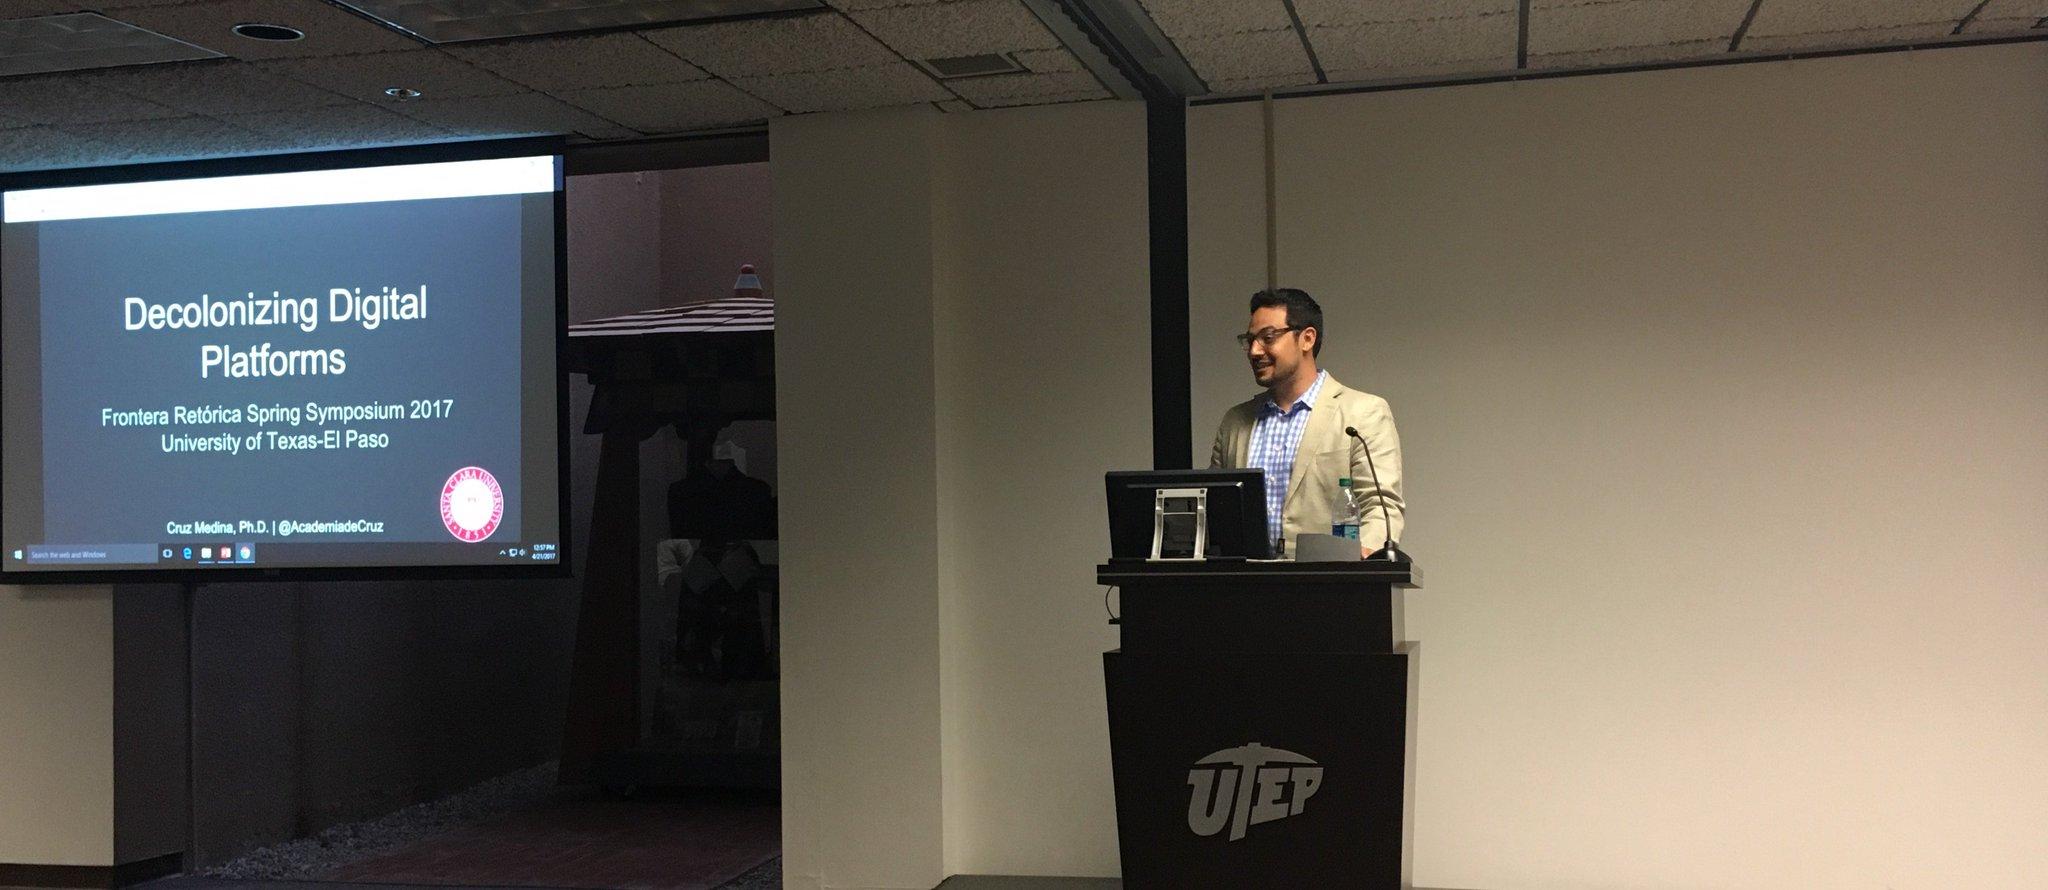 . @AcademiadeCruz speaking at the 2017 Spring Symposium. #UTEPRWS https://t.co/J6qNmBh1Kc